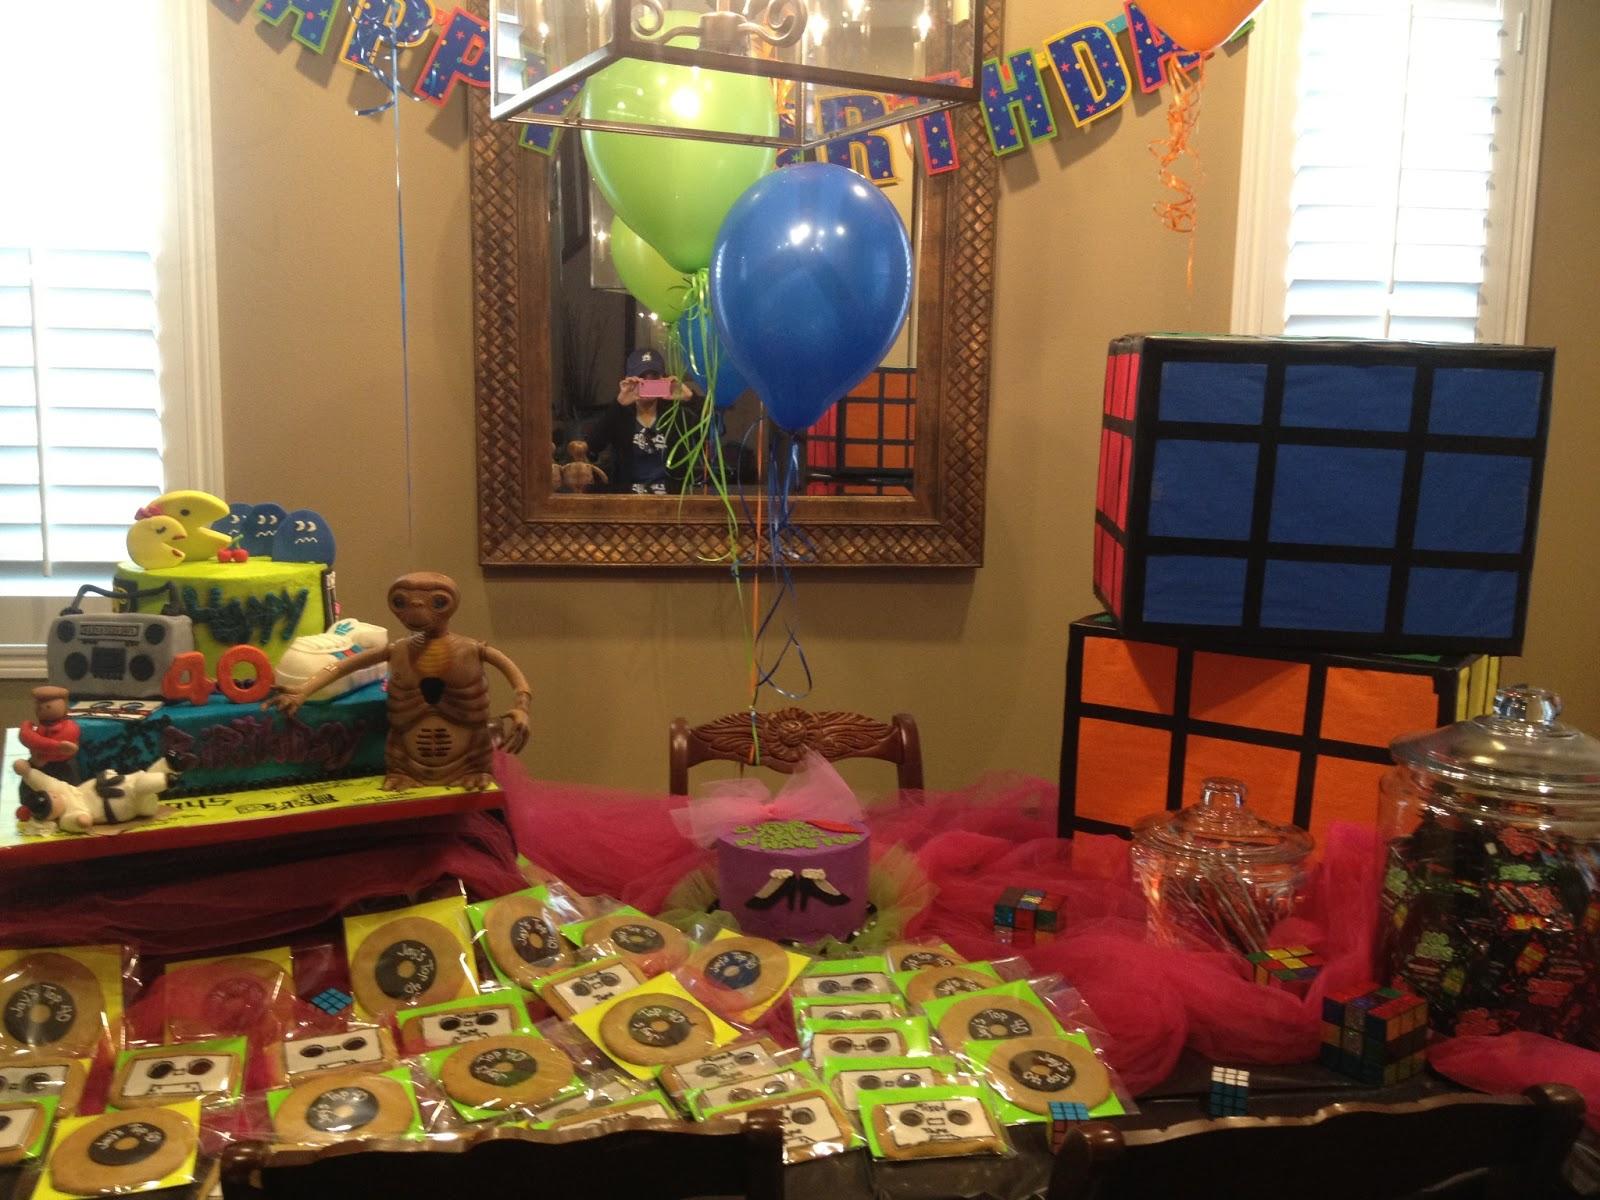 Three crafty cousins diy rubix cubes 80 39 s theme for 80s decoration ideas